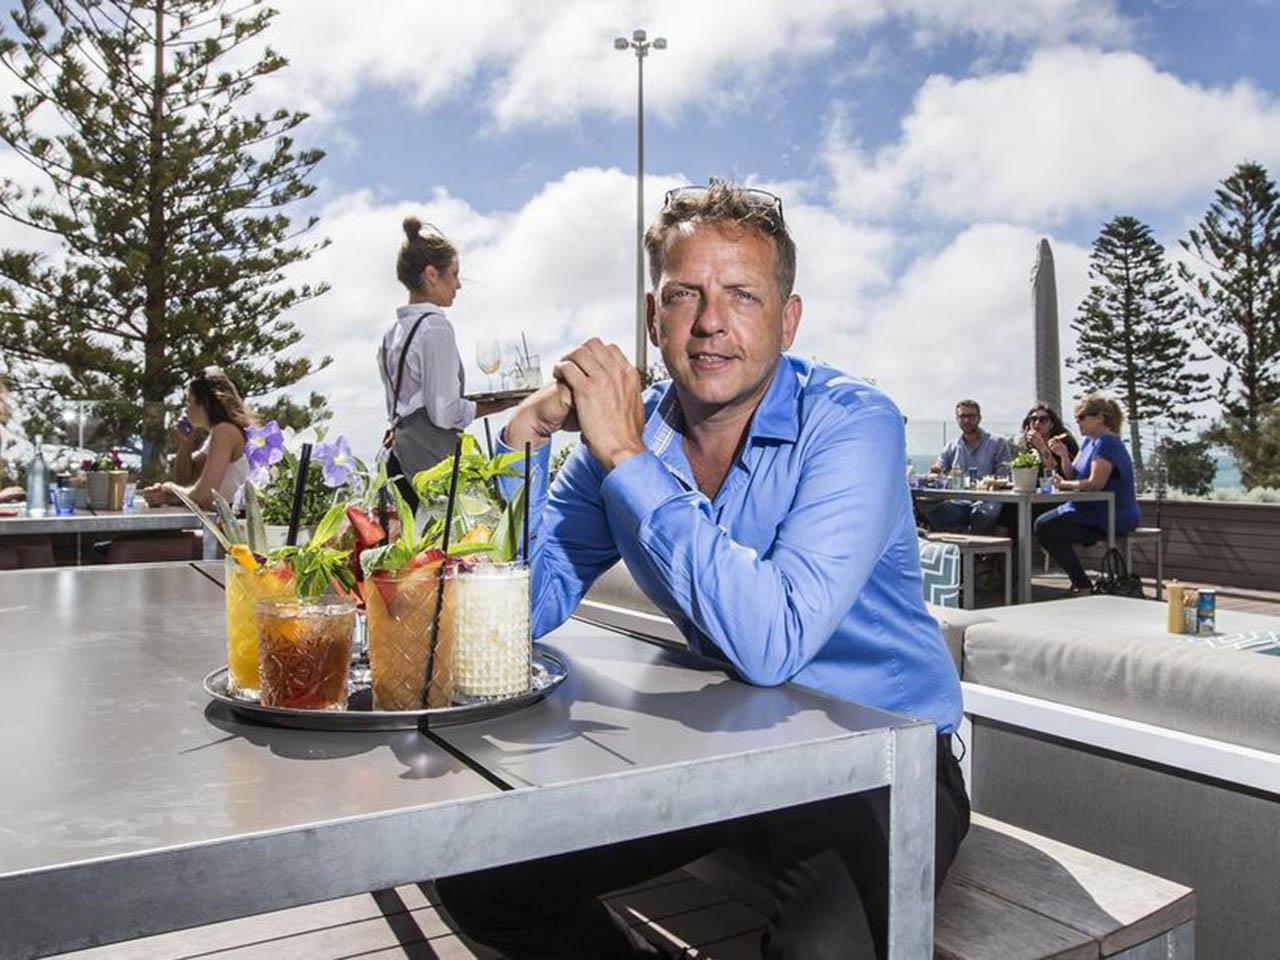 Man With Variety Of Fresh Juice Sitting In Odeyssea's Open Air Restaurant